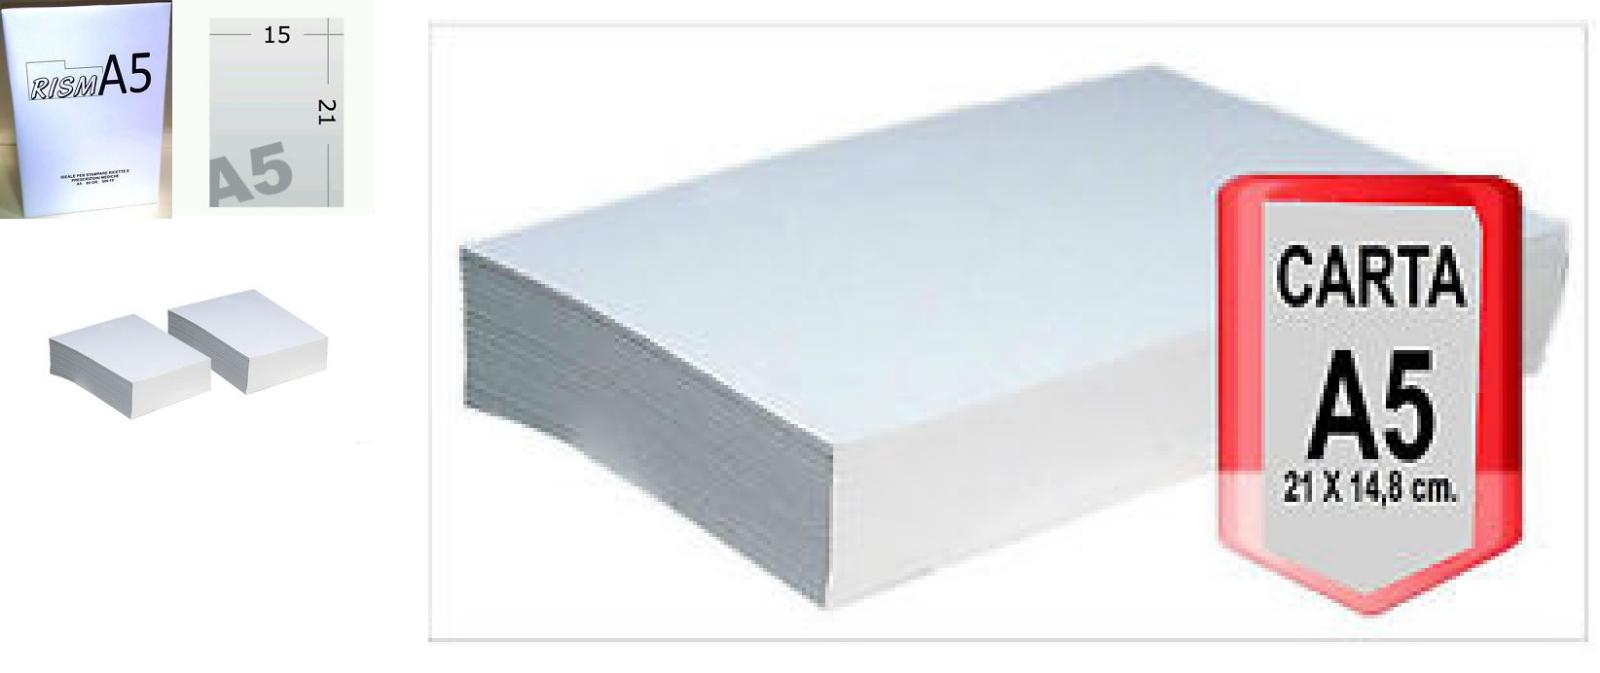 FAVINI confezione da 12 pezzi carta copy a5 148x210mm 80gr 500fg bianca favini